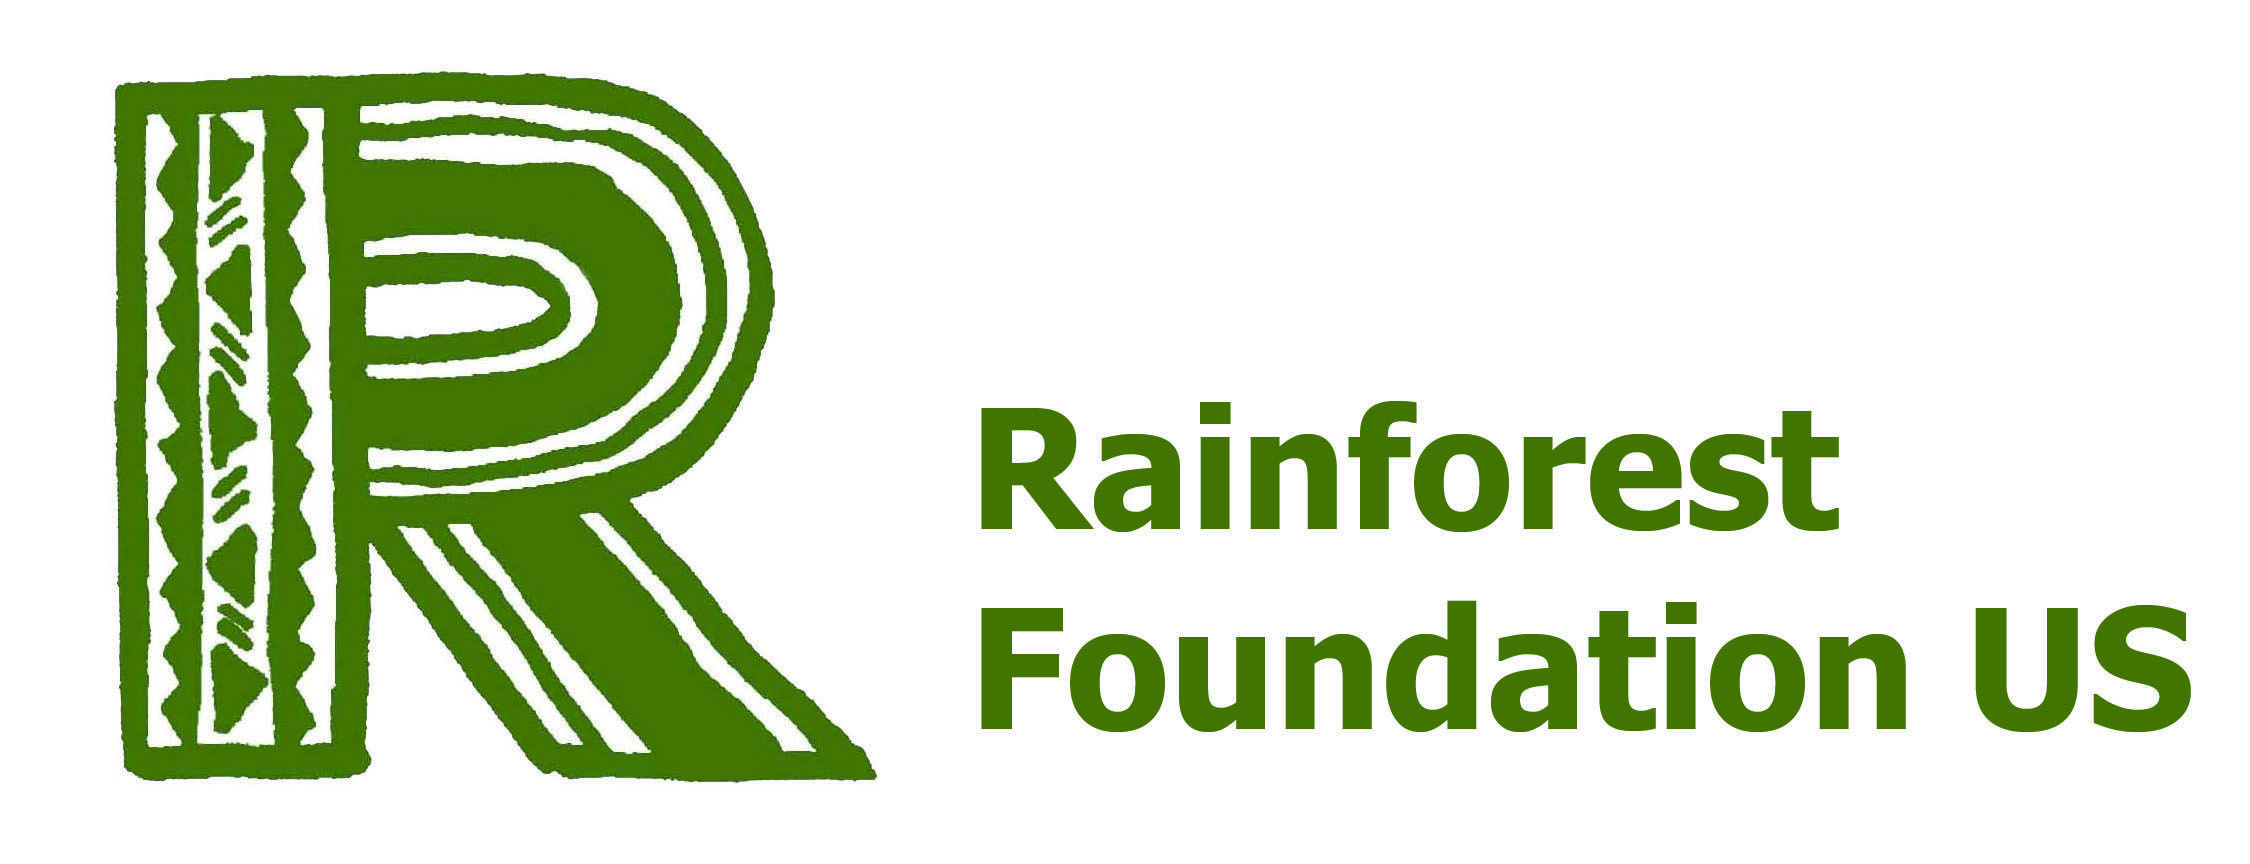 Image result for rainforest foundation